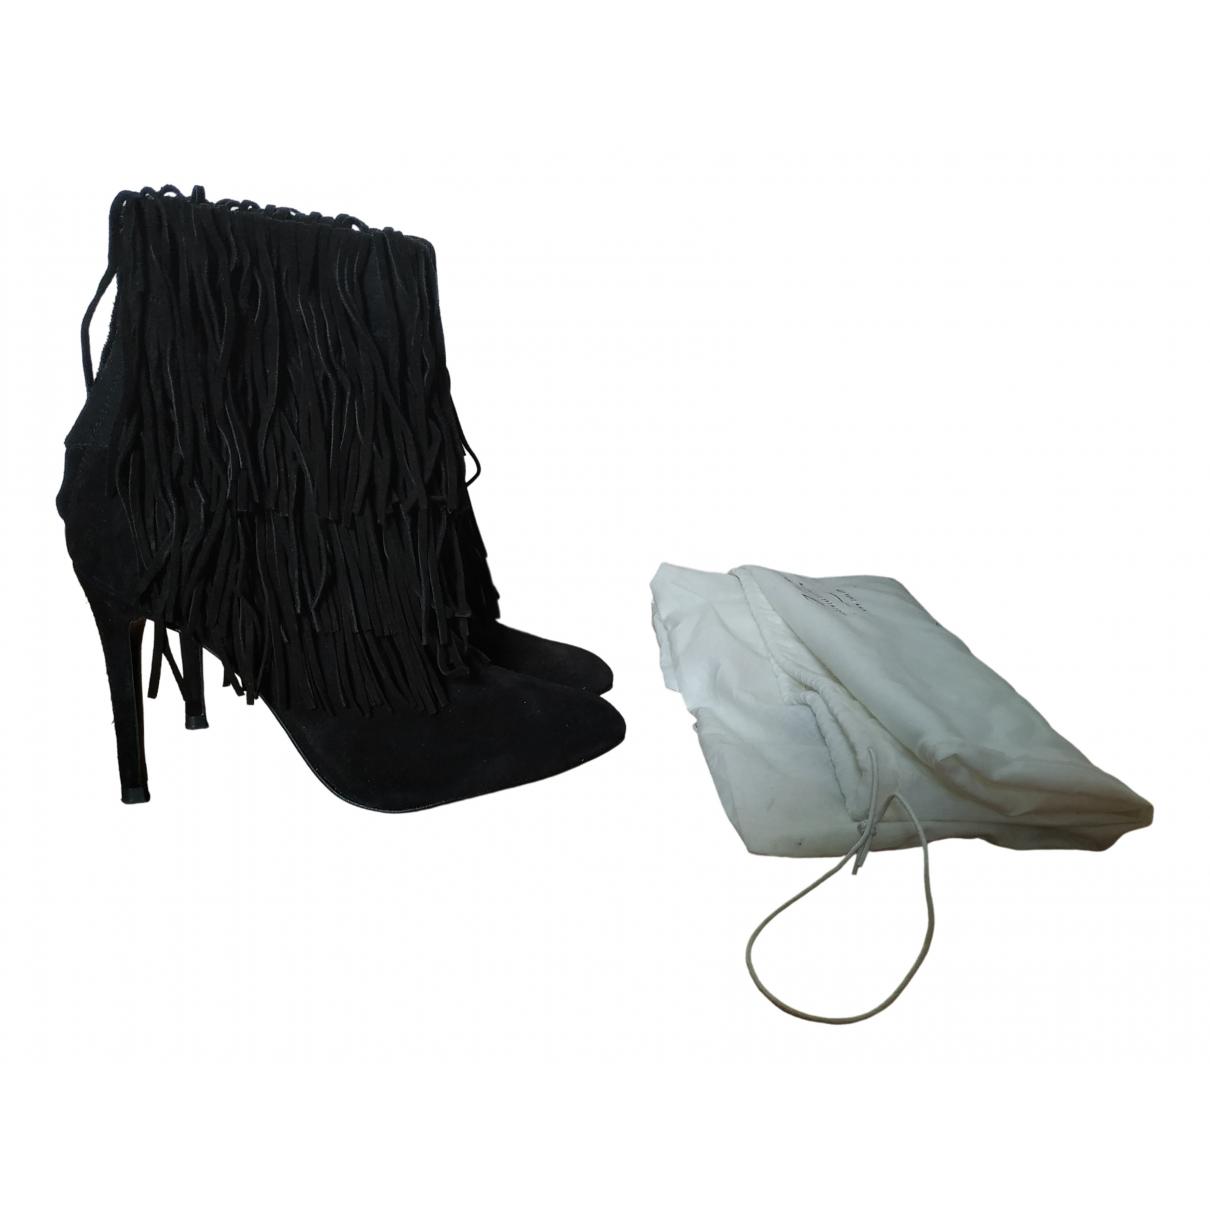 Zara N Black Suede Ankle boots for Women 38 EU